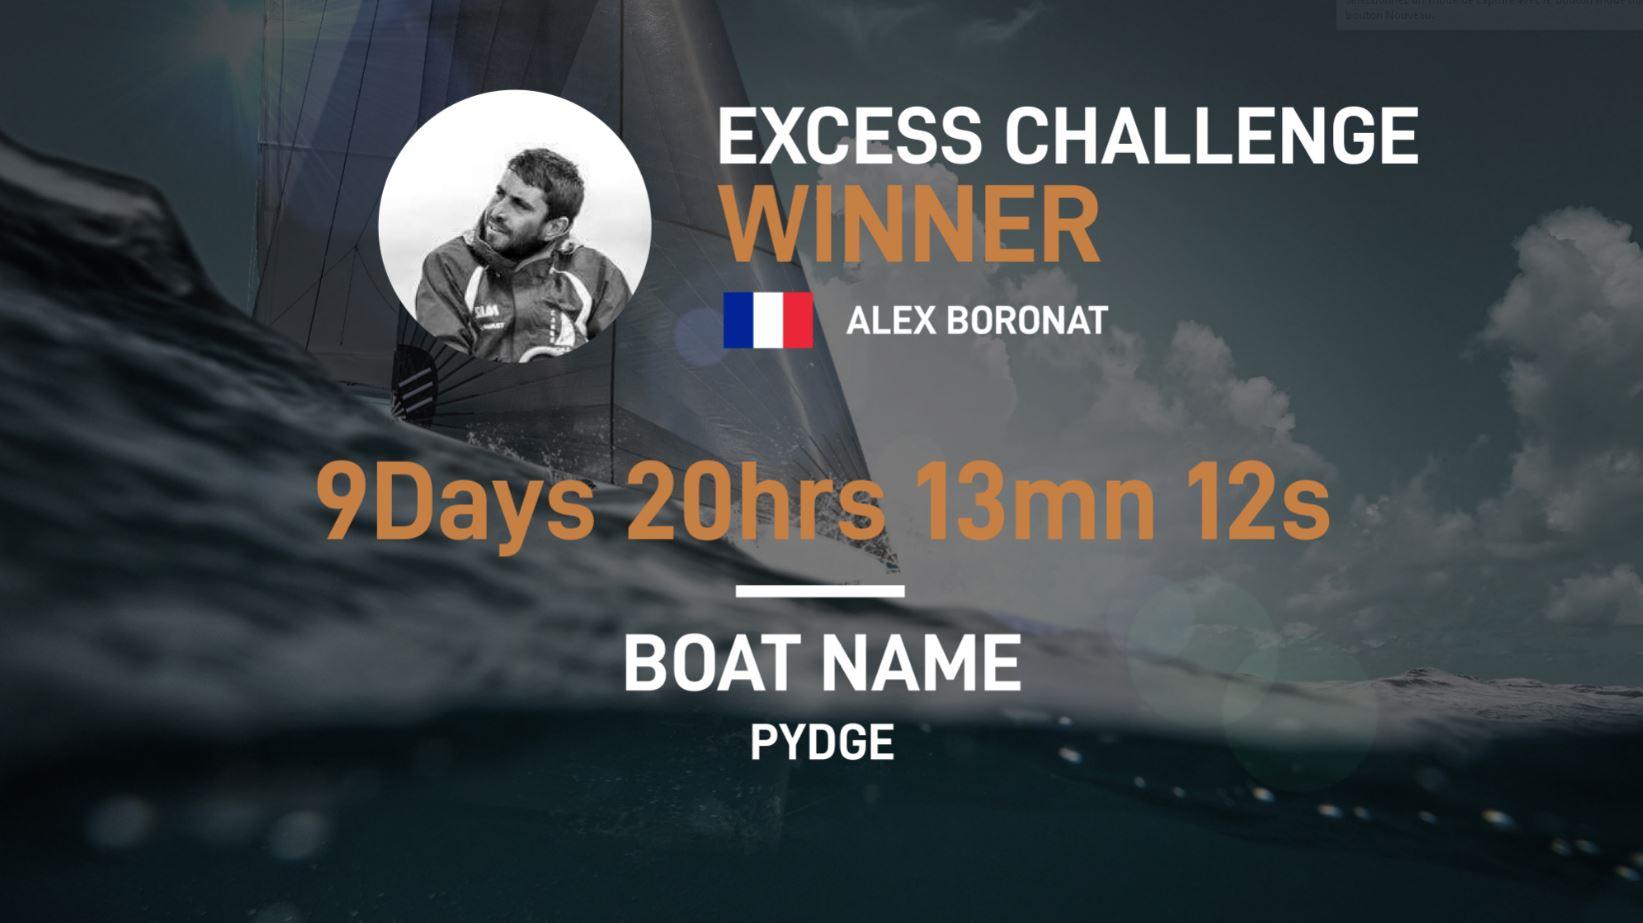 Excess Challenge Winner